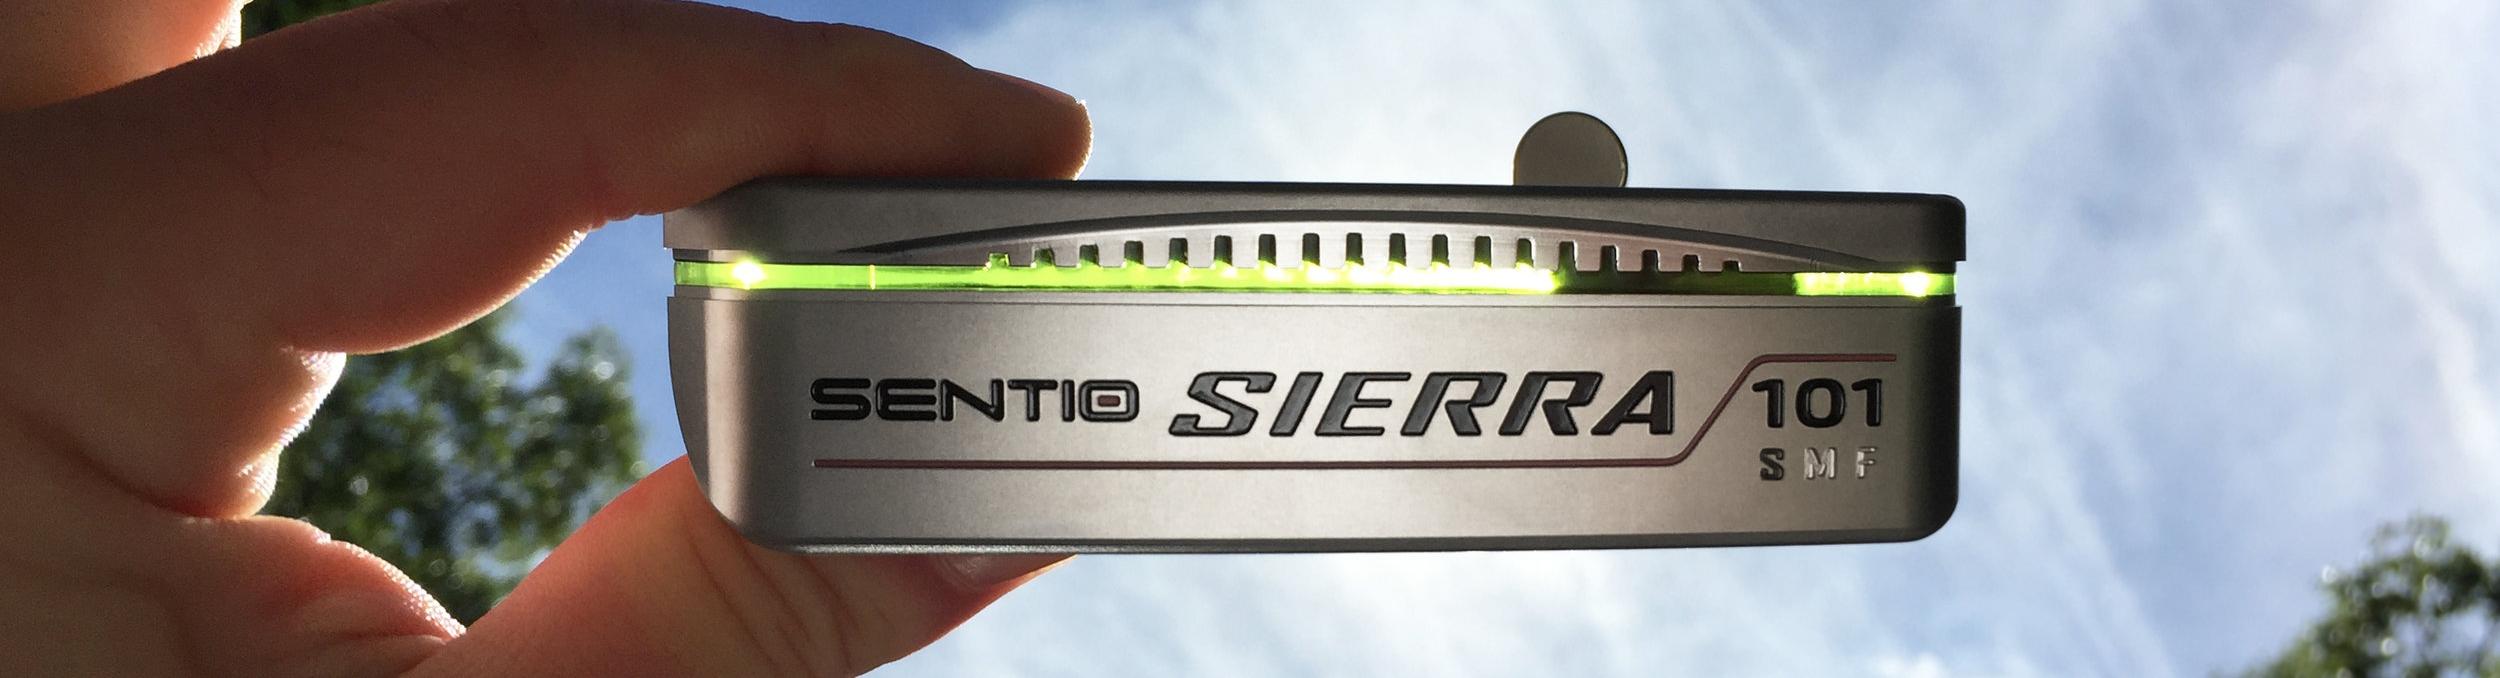 Sentio-sky.jpg